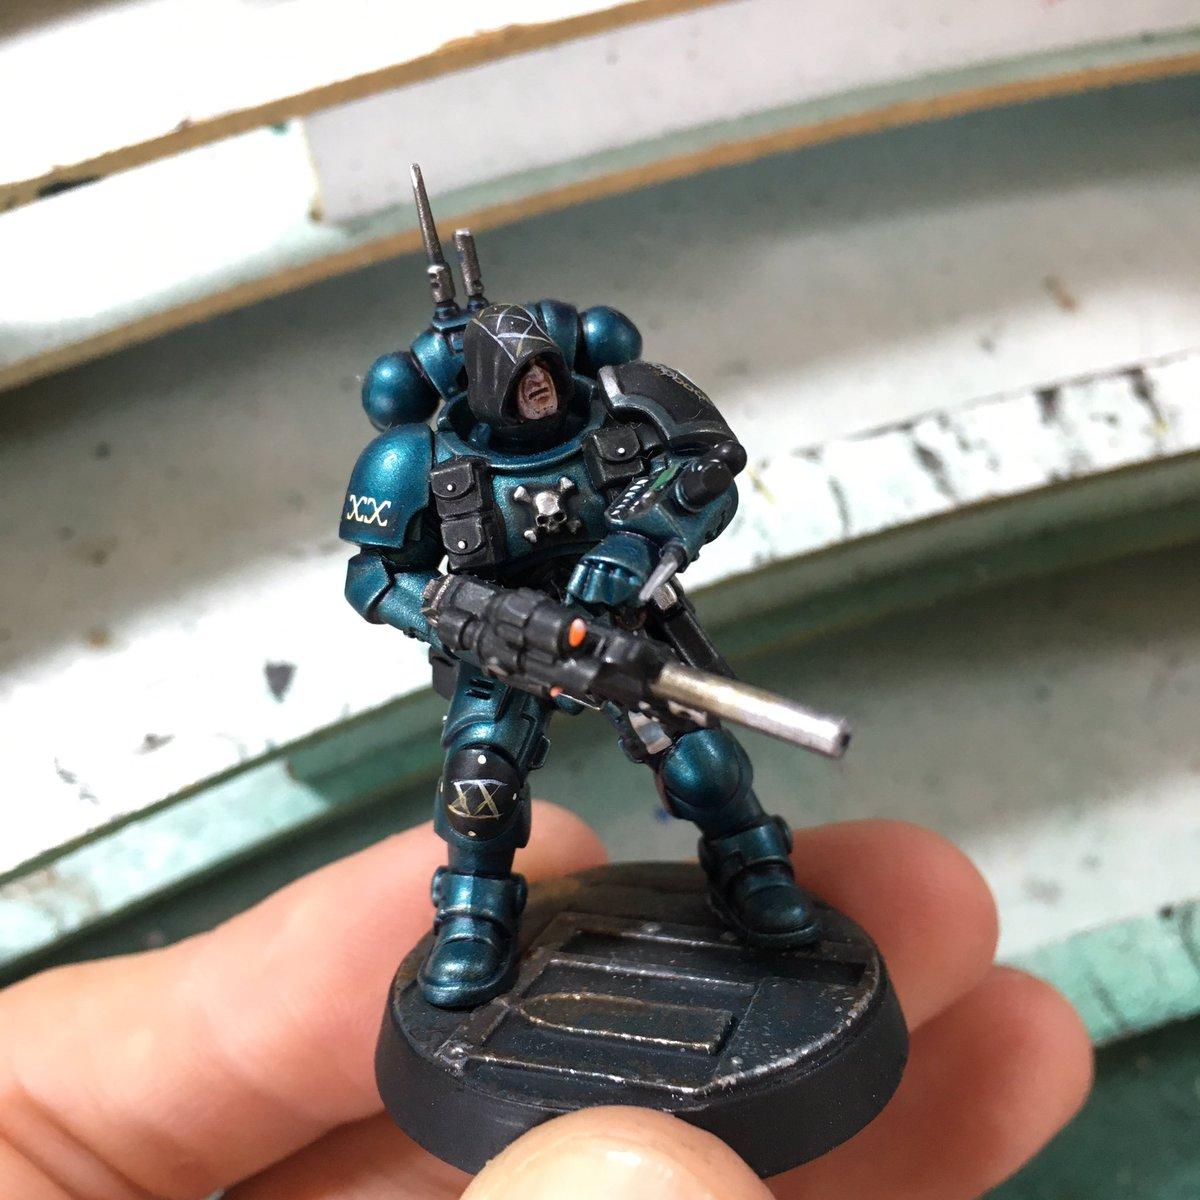 Alpha Legionnaire WIP III  #paintingwarhammer #gamesworkshop #warhammer40k #paintingblacklibrary #paintingwarhammer40k #warhammercomunity #paintingforgeworld #spacemarines #new40k #adeptusastartes https://t.co/22reoQGruX